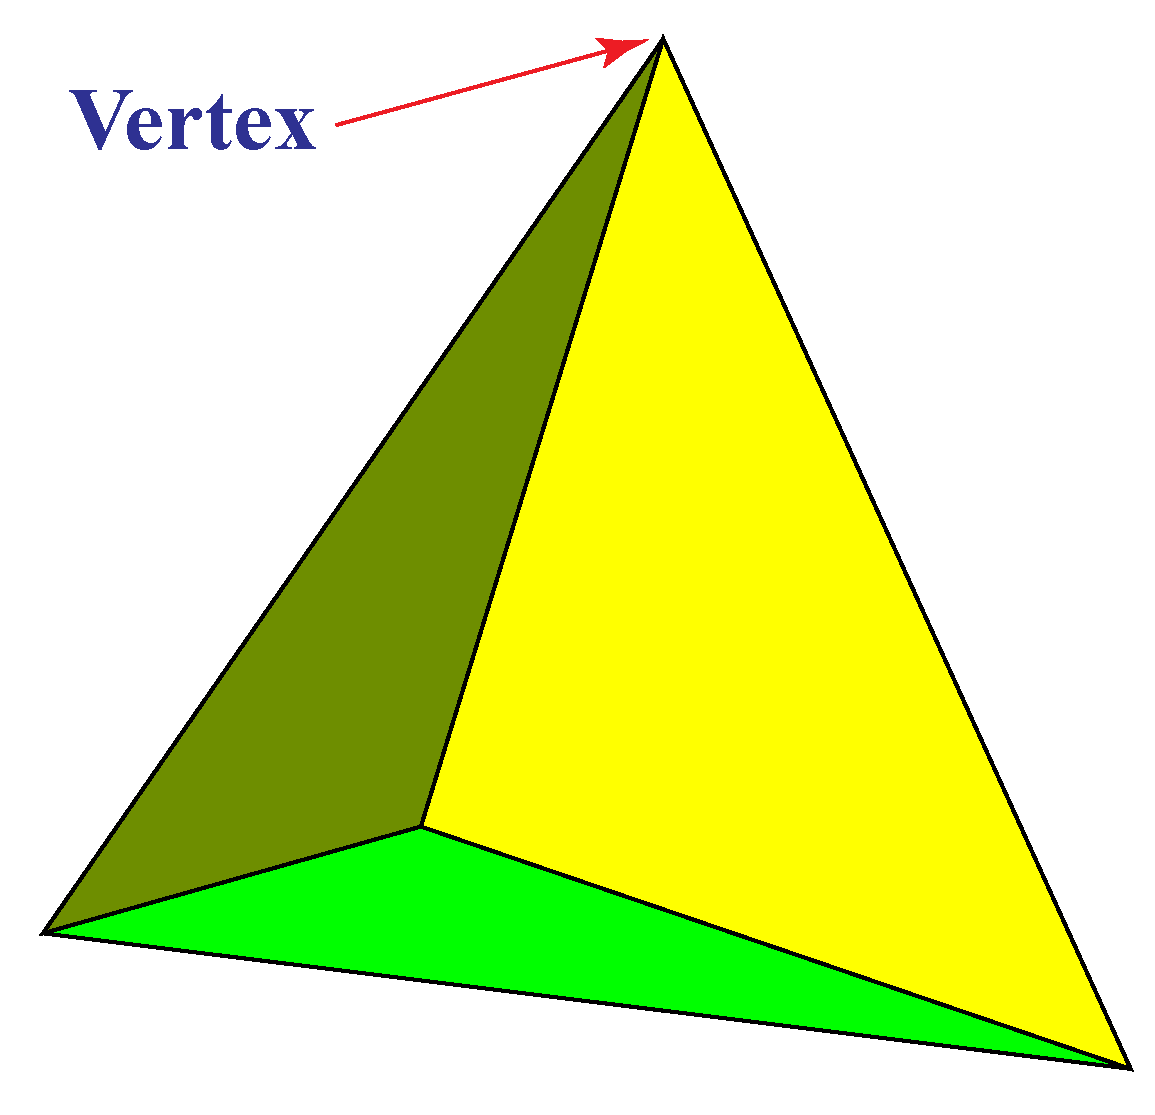 Vertex -Definition, Facts & Examples - Cuemath